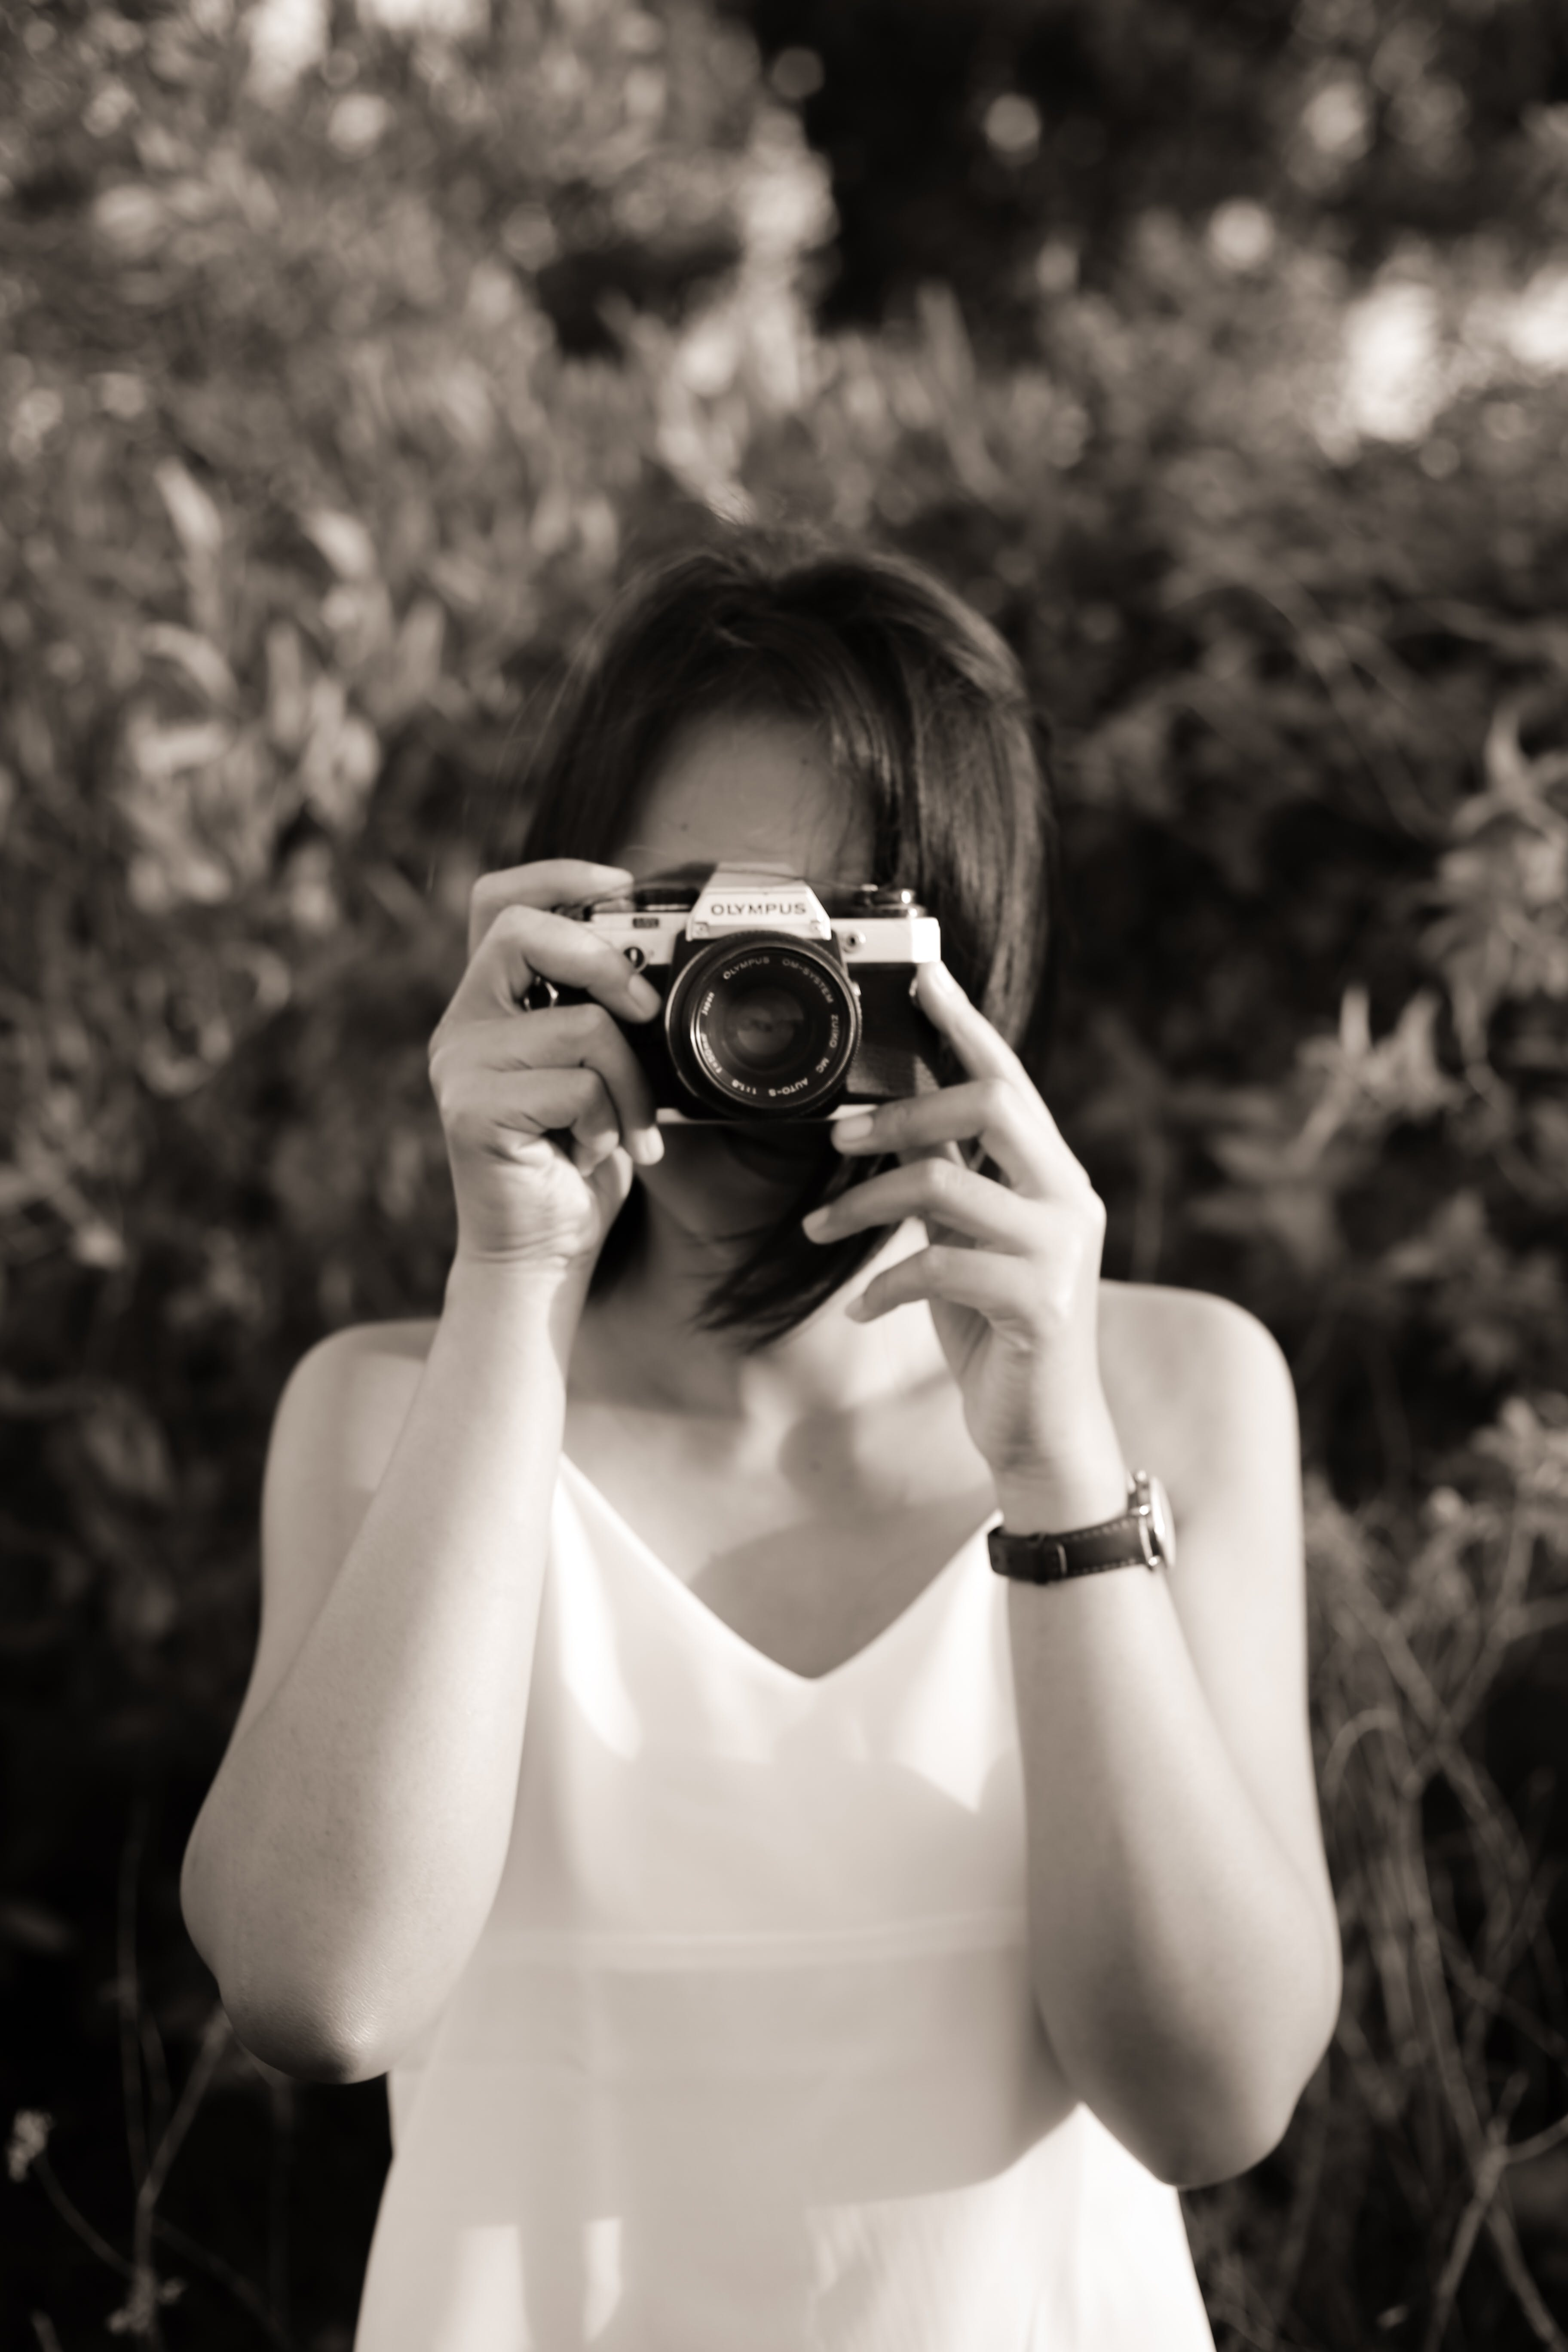 Free stock photo of analog camera, bali, monochrome photography, olympus om 10